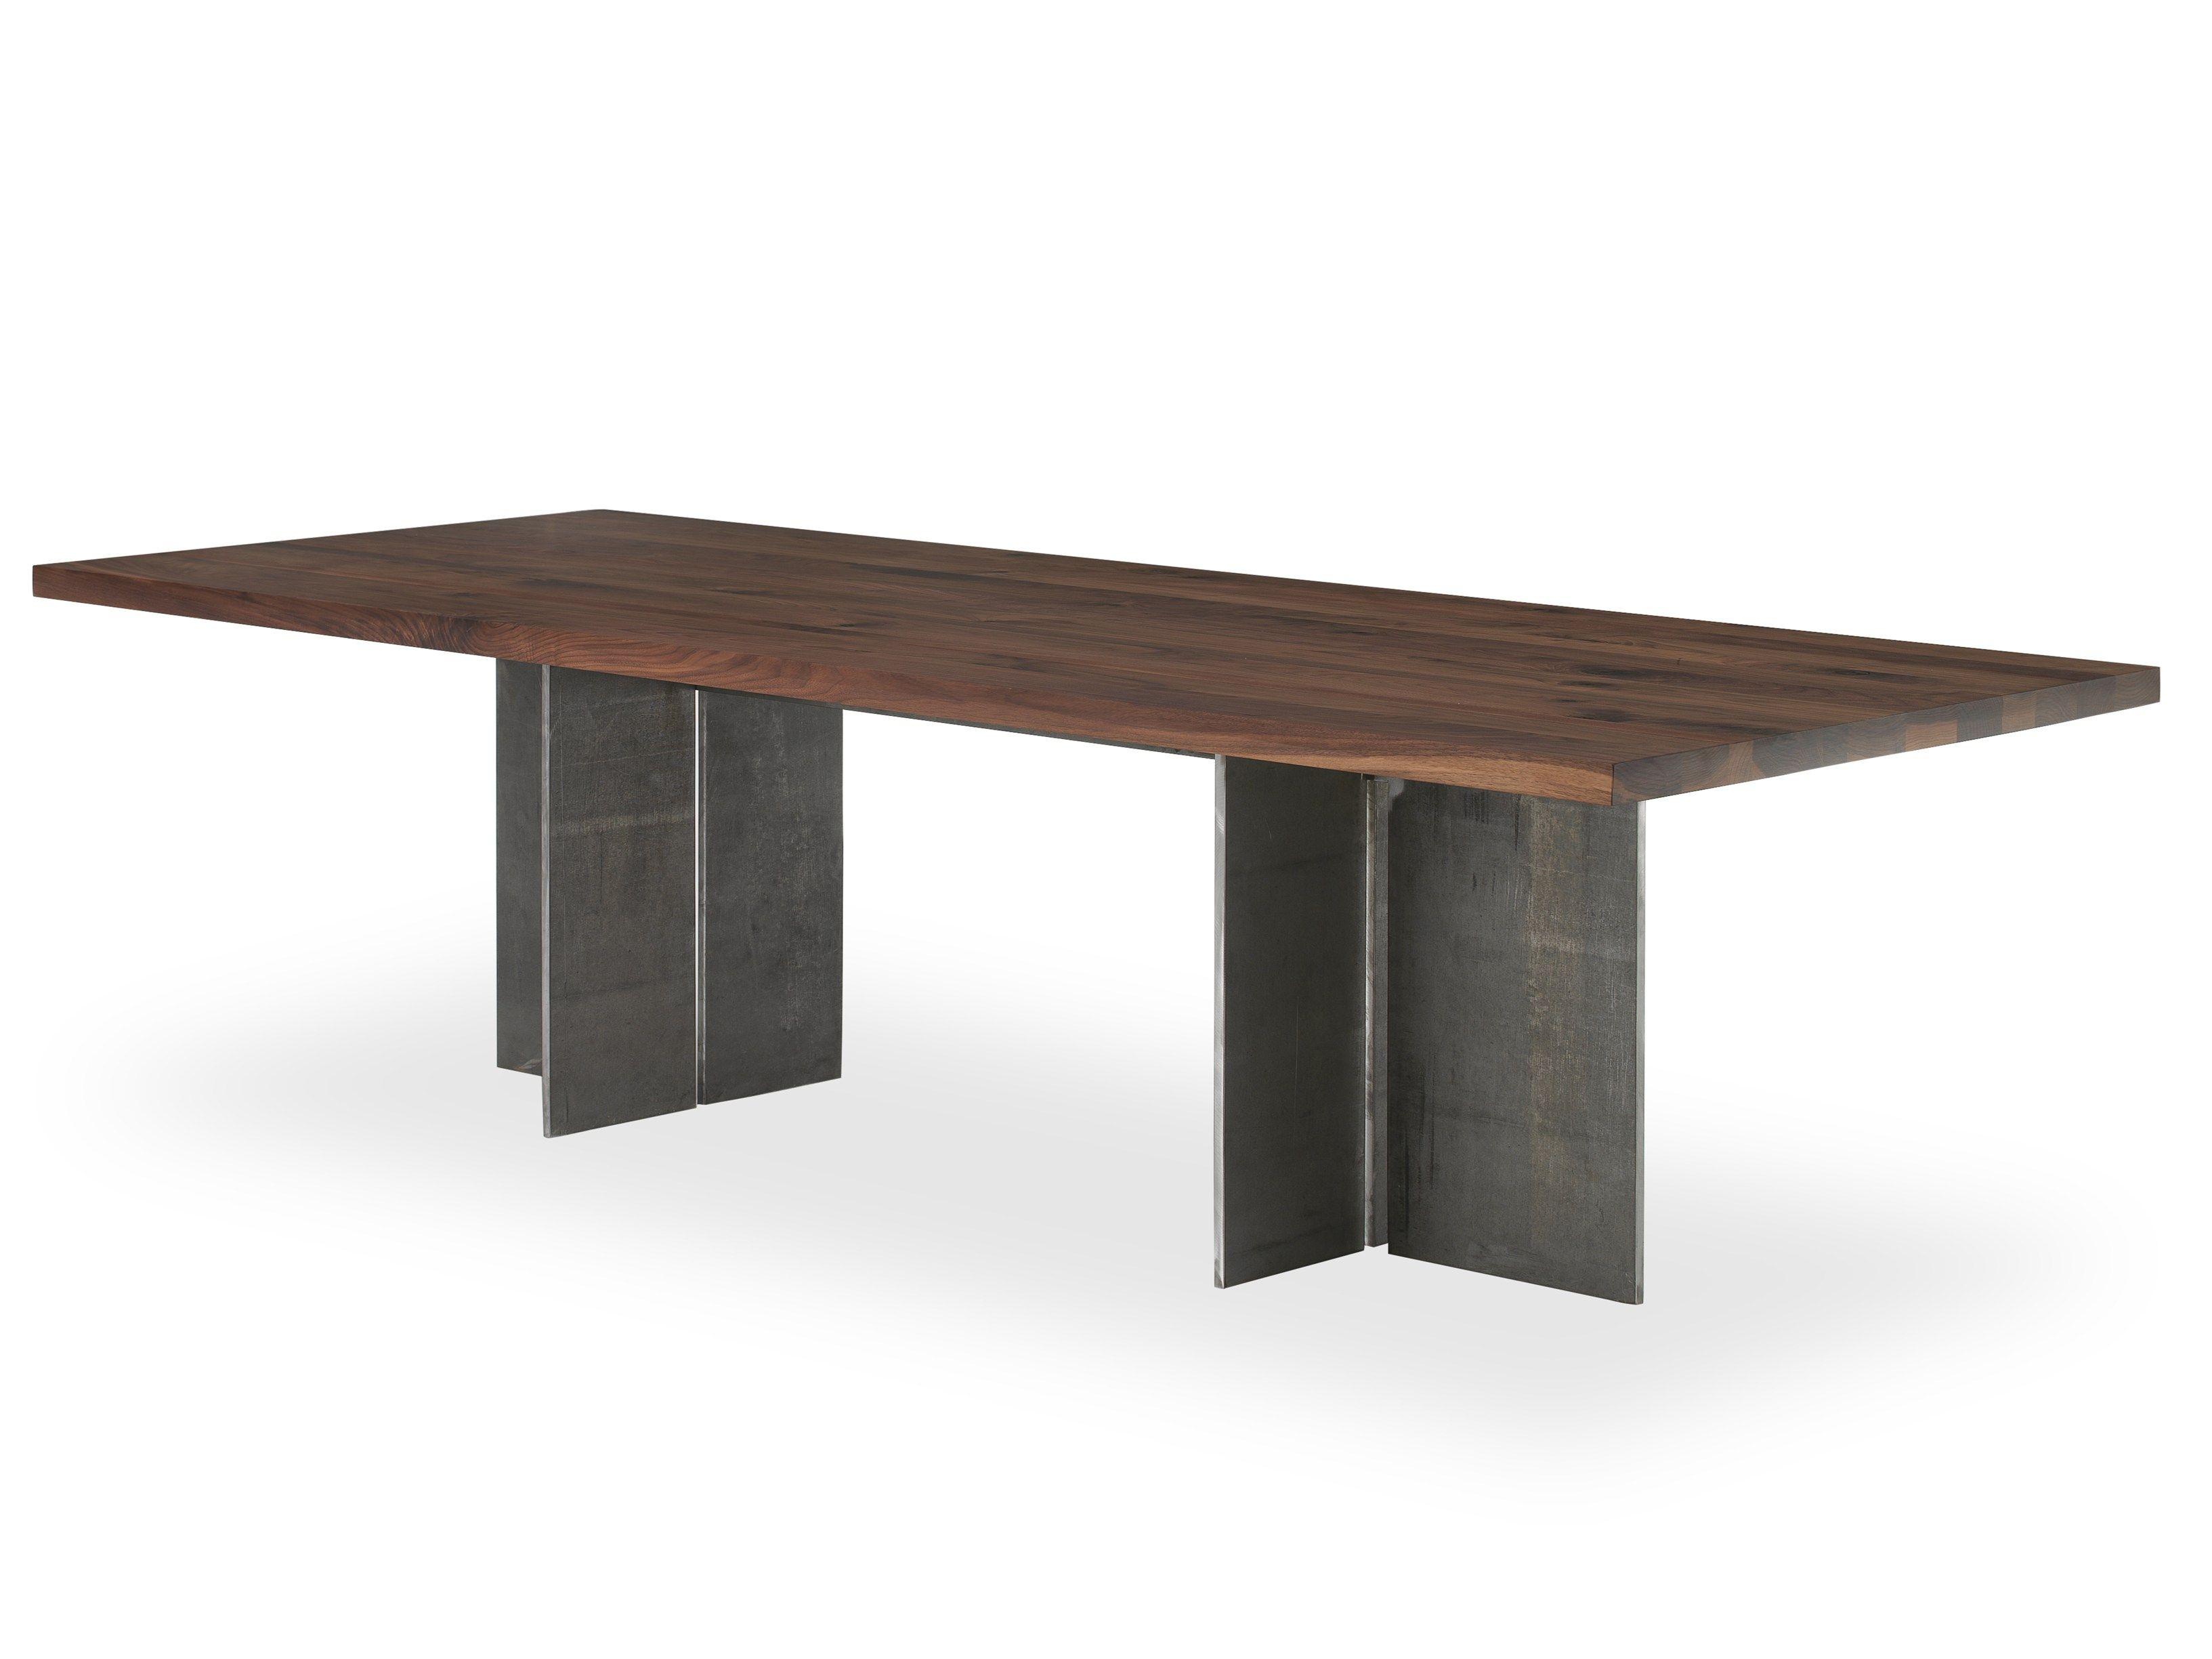 NEWTON | Tisch By Riva 1920 Design C.R.&S. RIVA1920